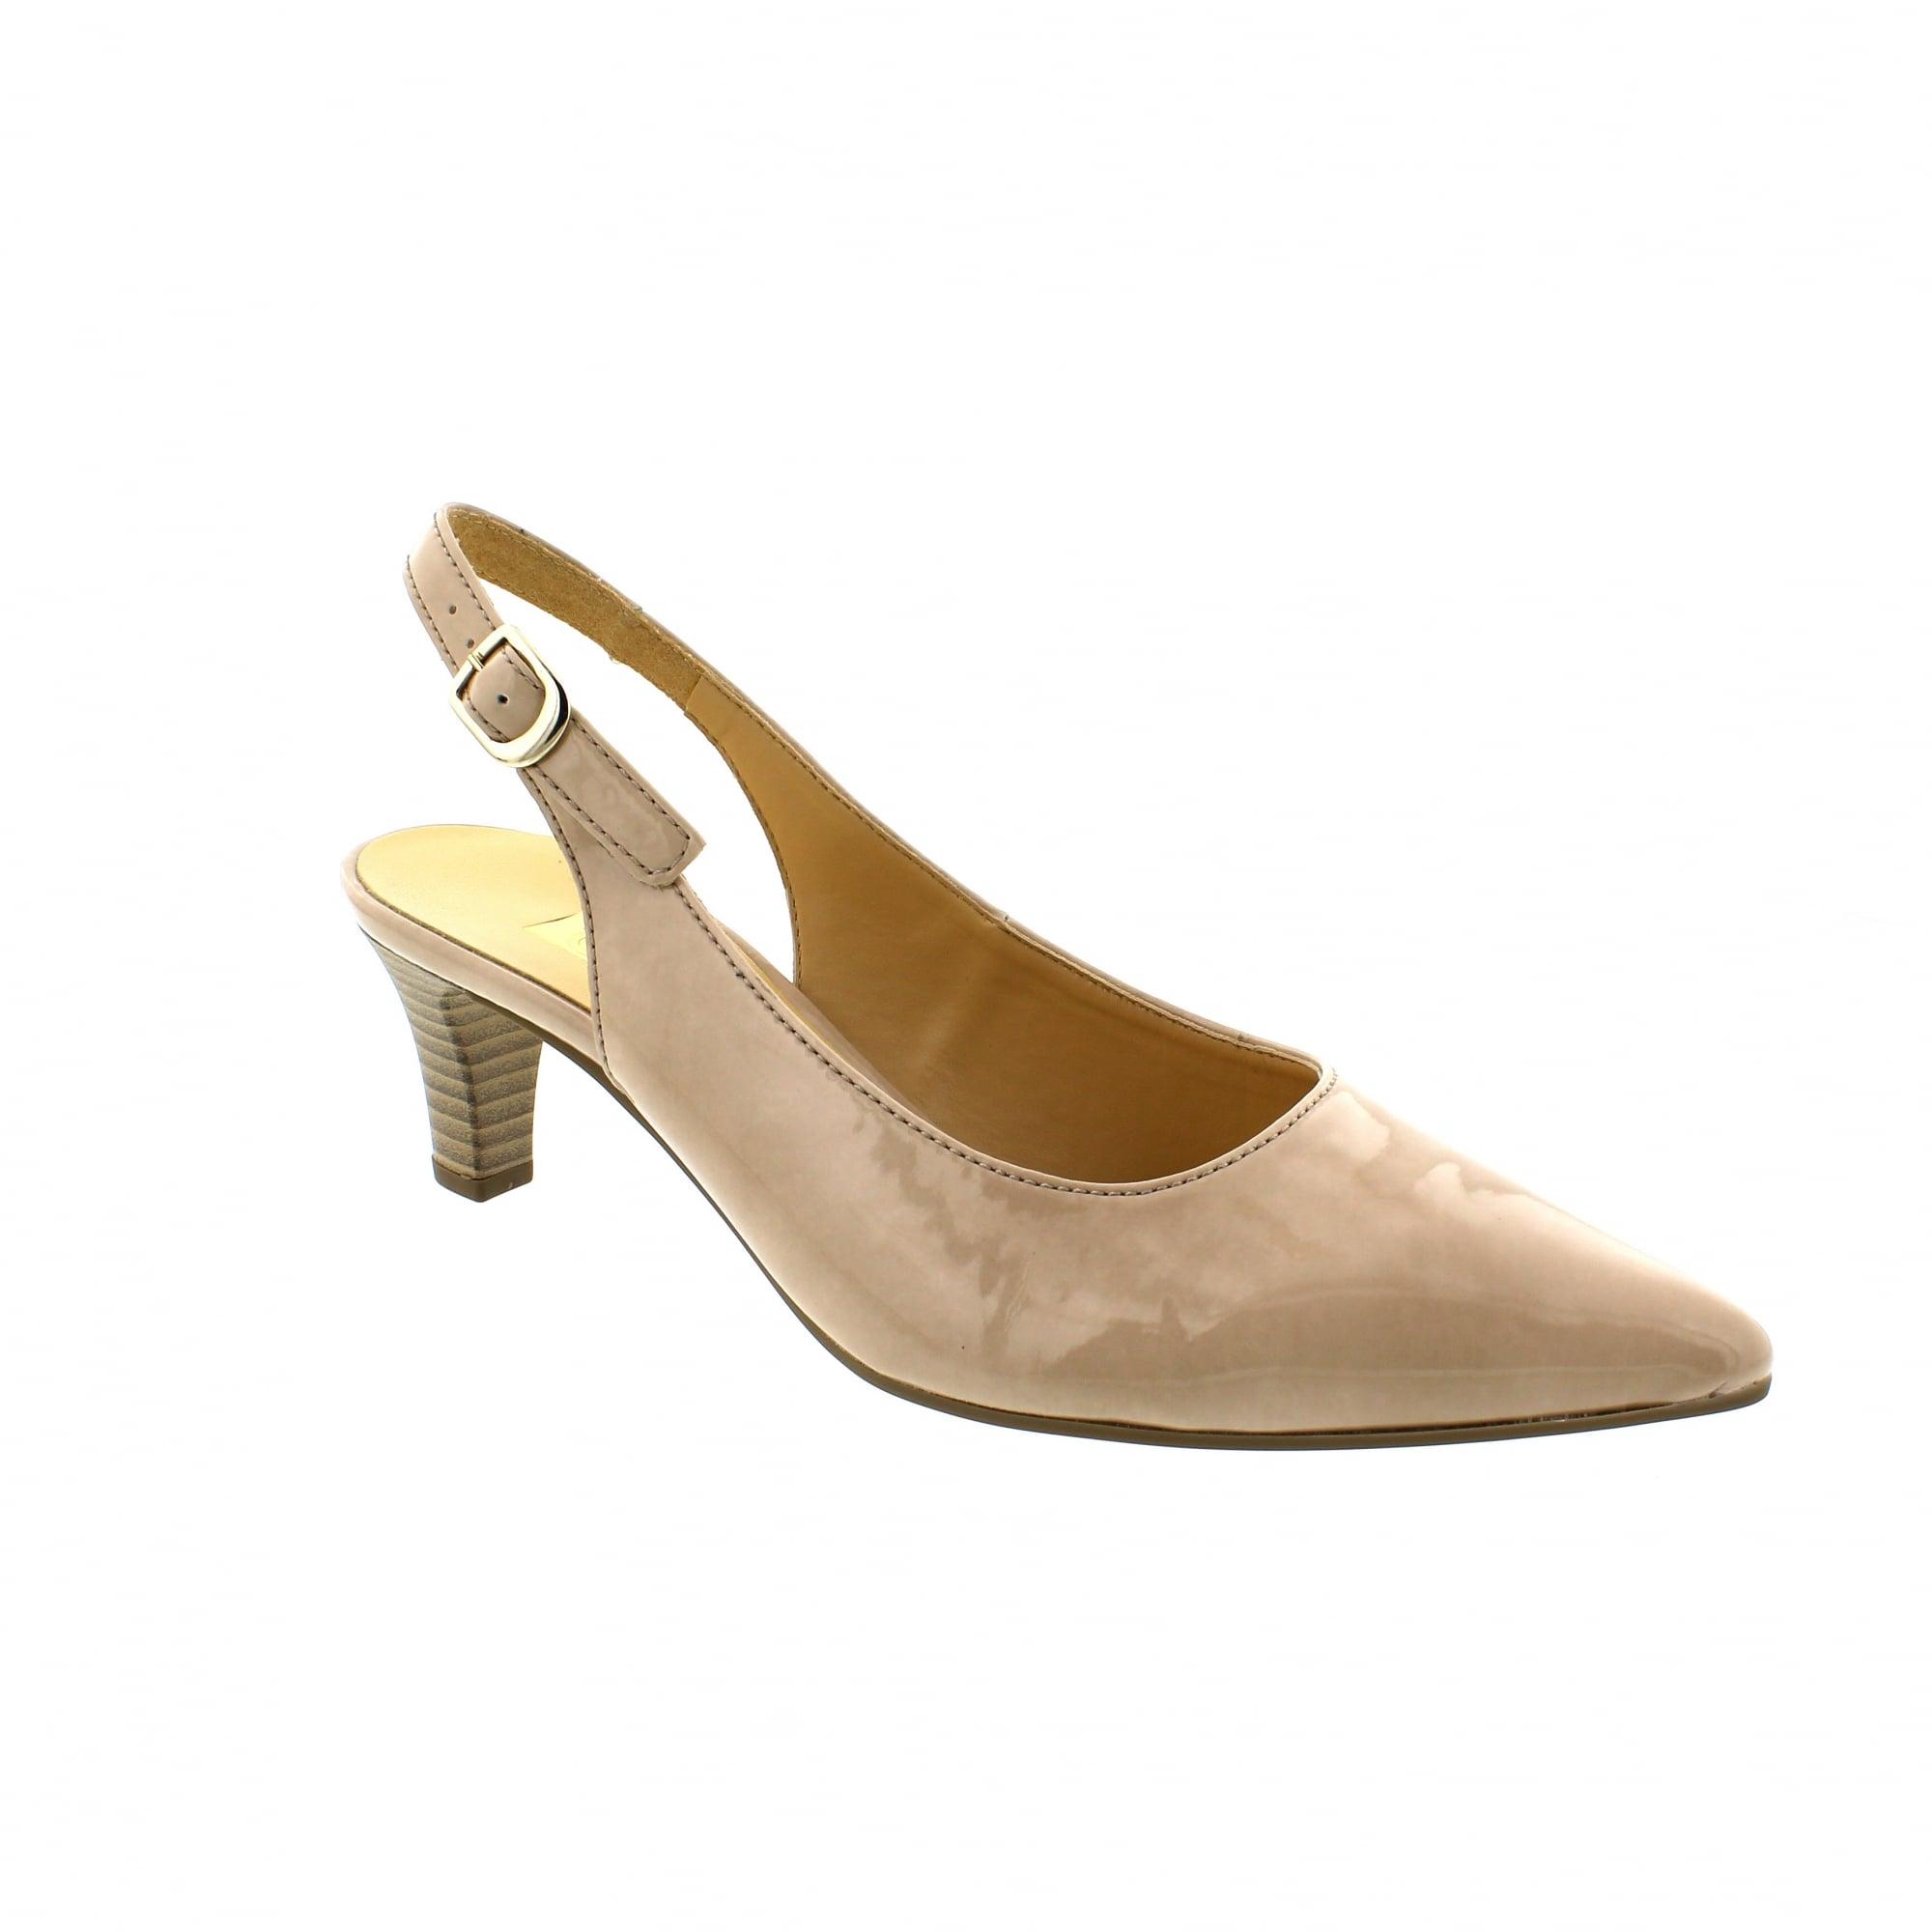 754f43b5f22 Gabor Hume II 81-550-72 Womens Court Shoes